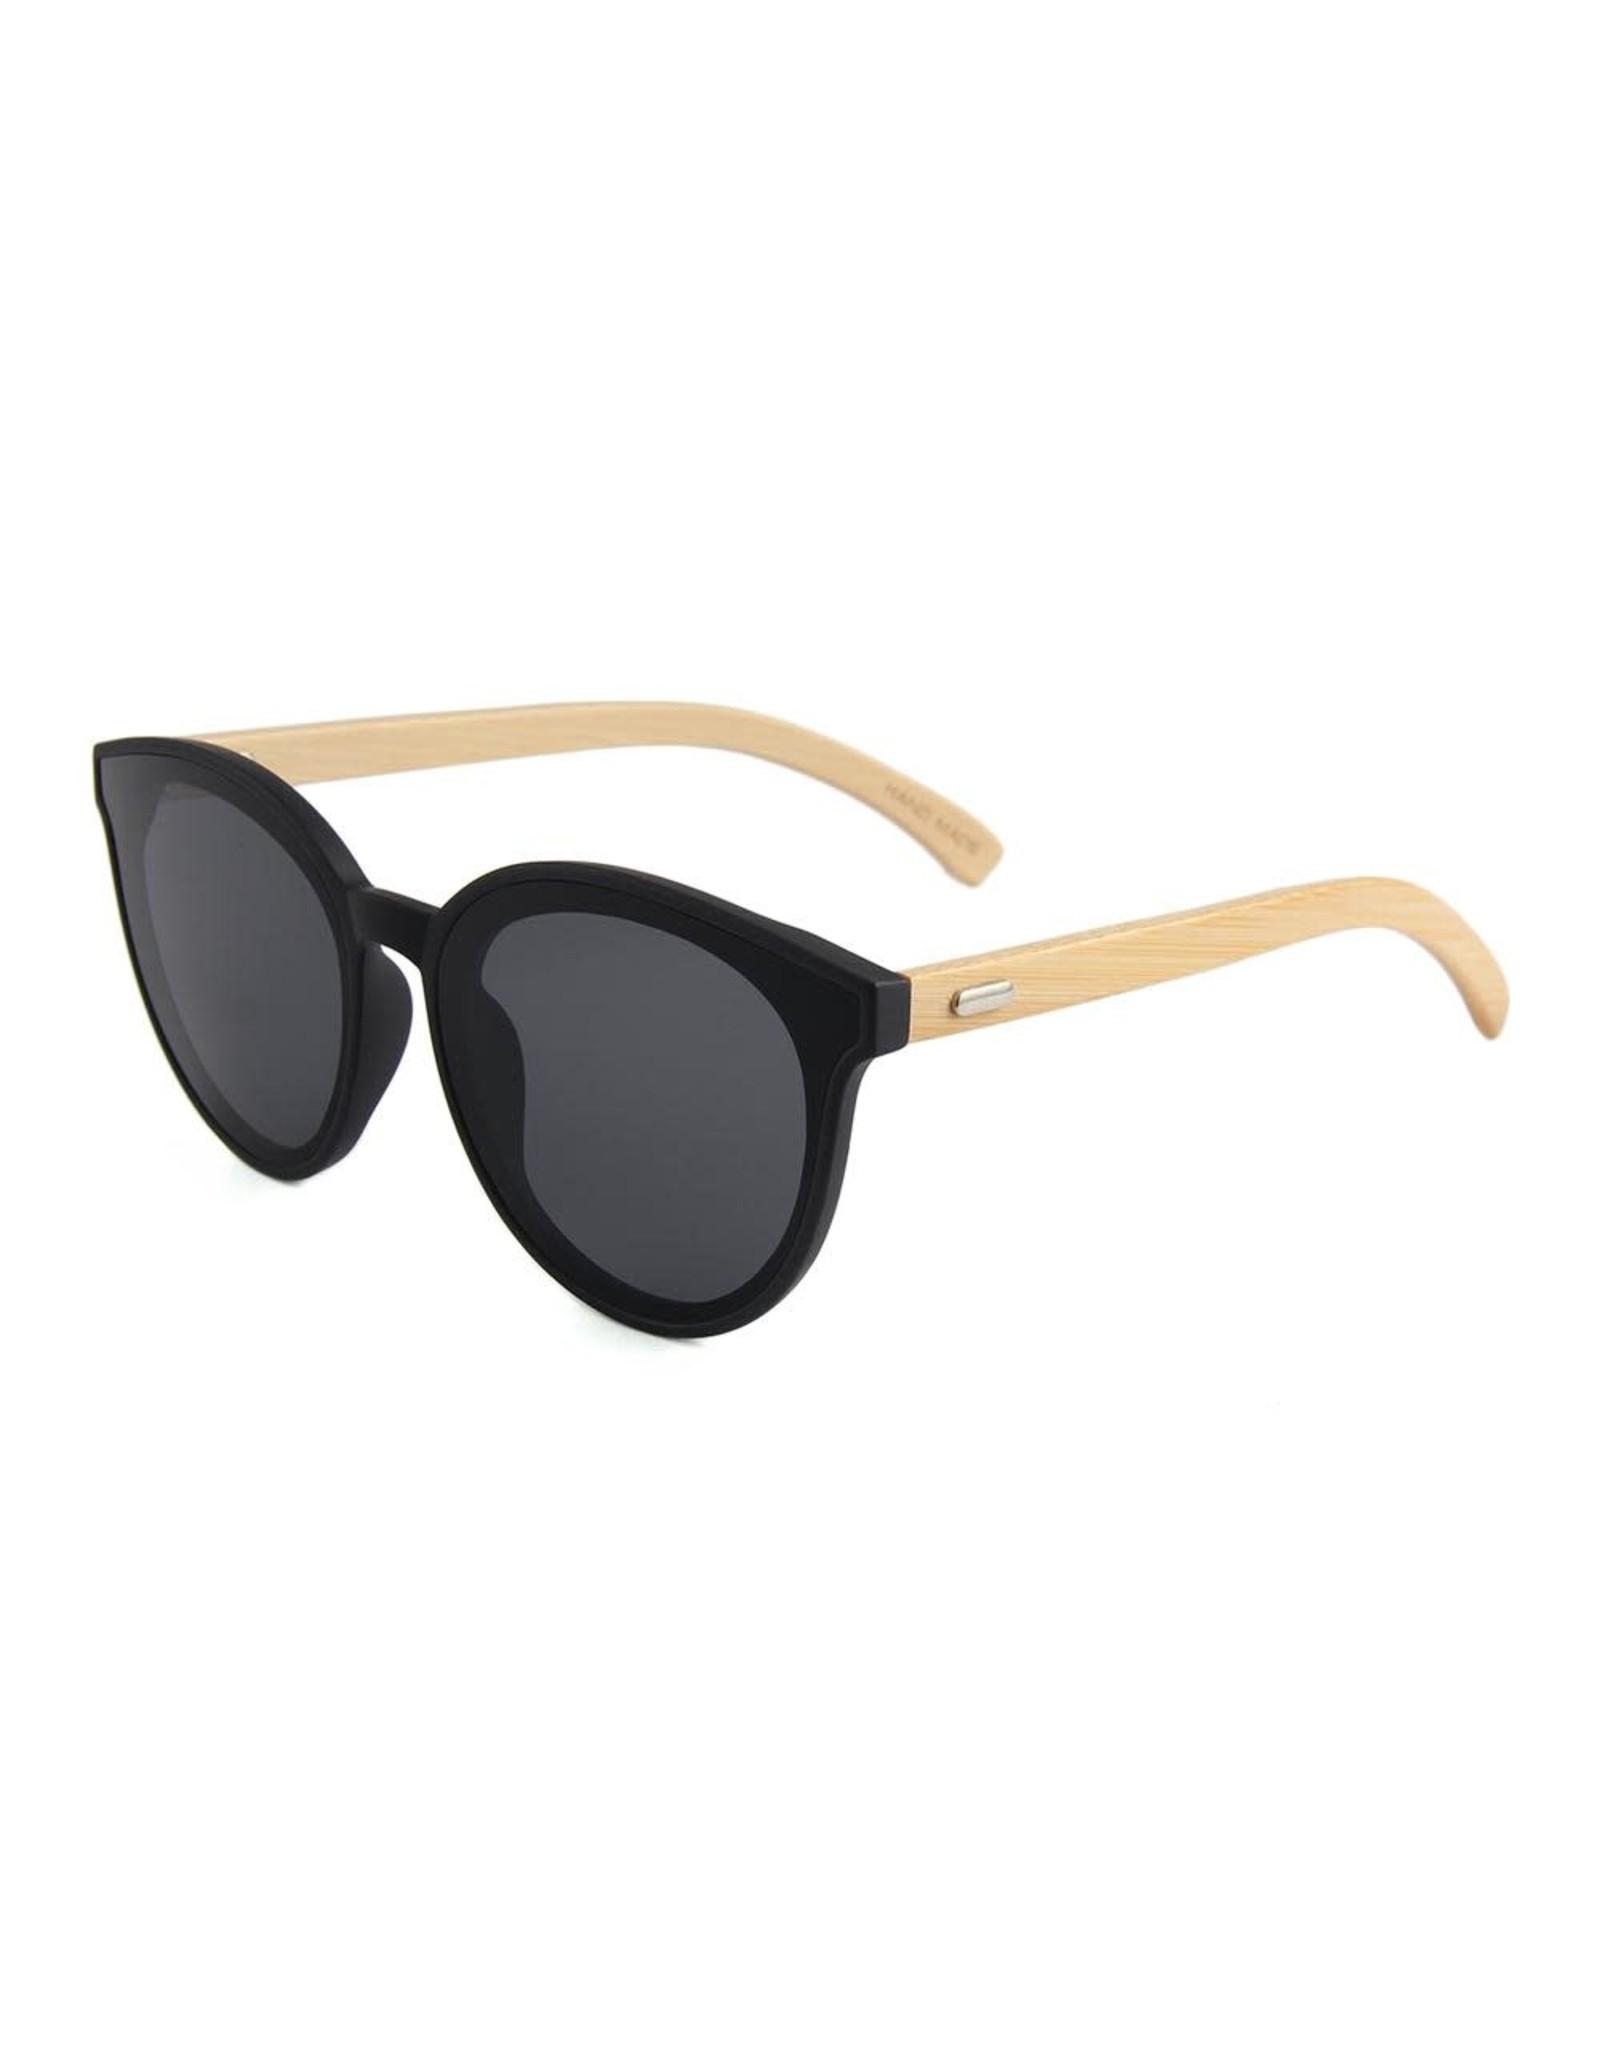 Mango Black Sunglasses